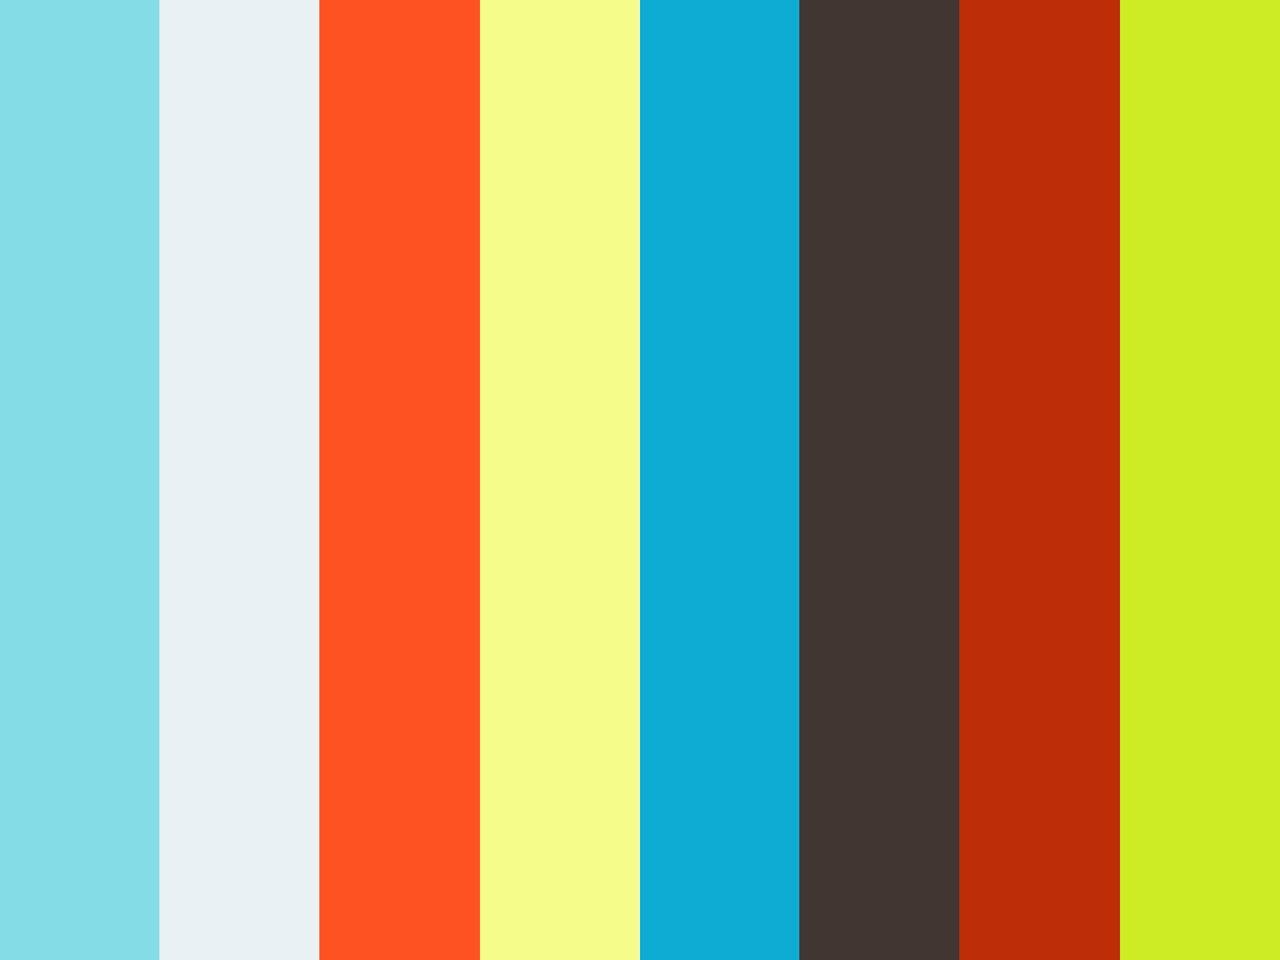 【SDE微電影】2017.02.25-Kevin & Miffy︱愛情微電影︱當日快剪快播SDE︱高雄大八大飯店